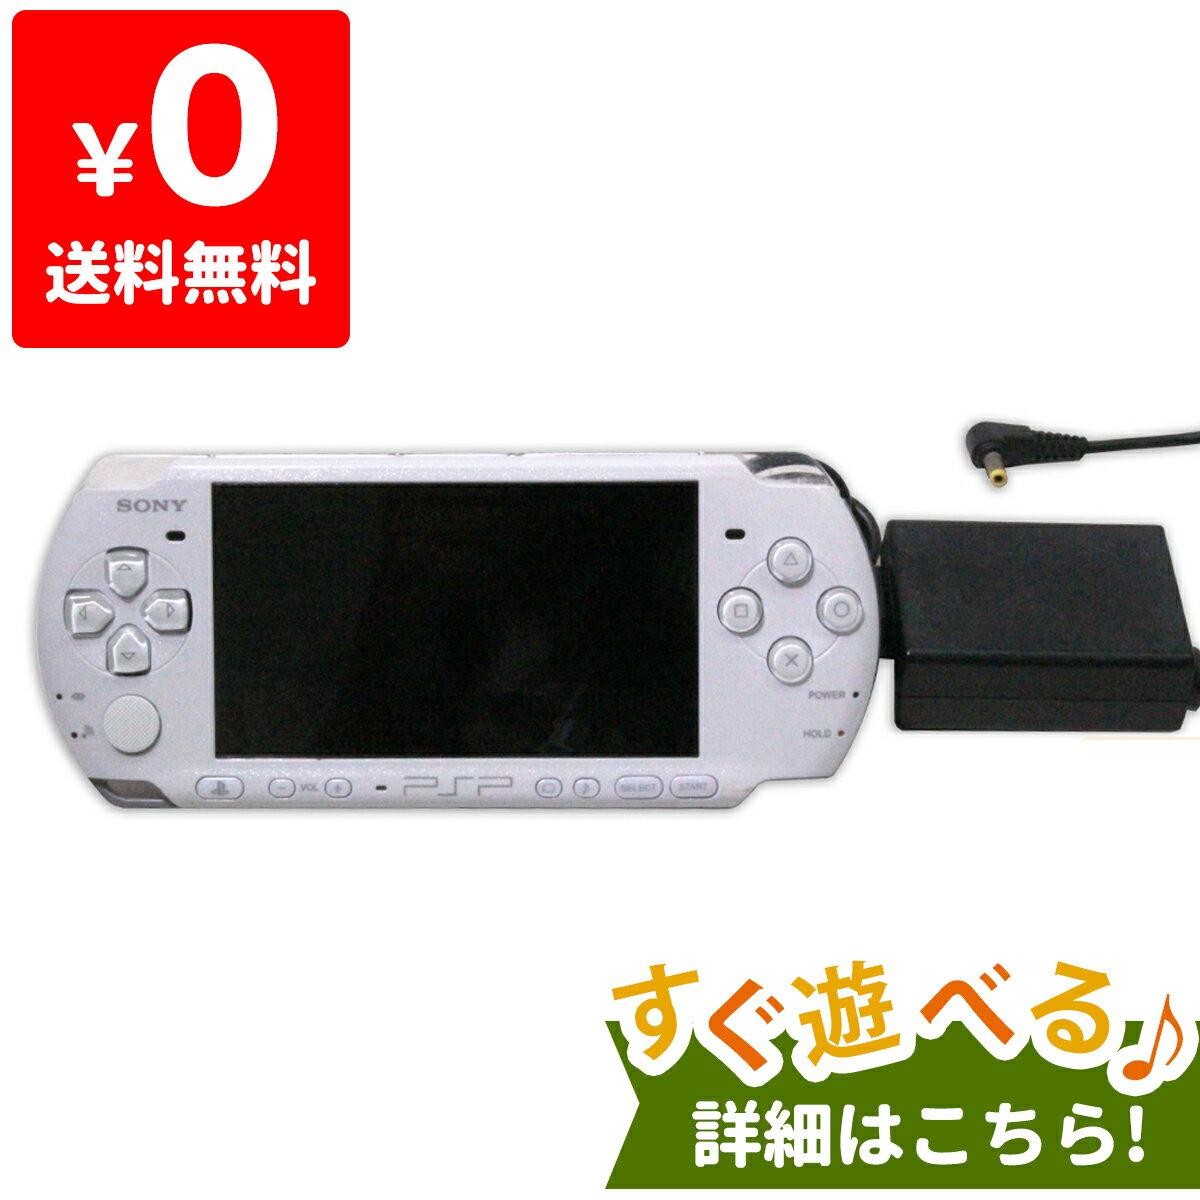 PSP プレイステーションポータブル 本体 中古 PSP-3000PW パール・ホワイト 白 シロ すぐ遊べるセット PlayStationPortable SONY ソニー 4948872411981 送料無料 【中古】